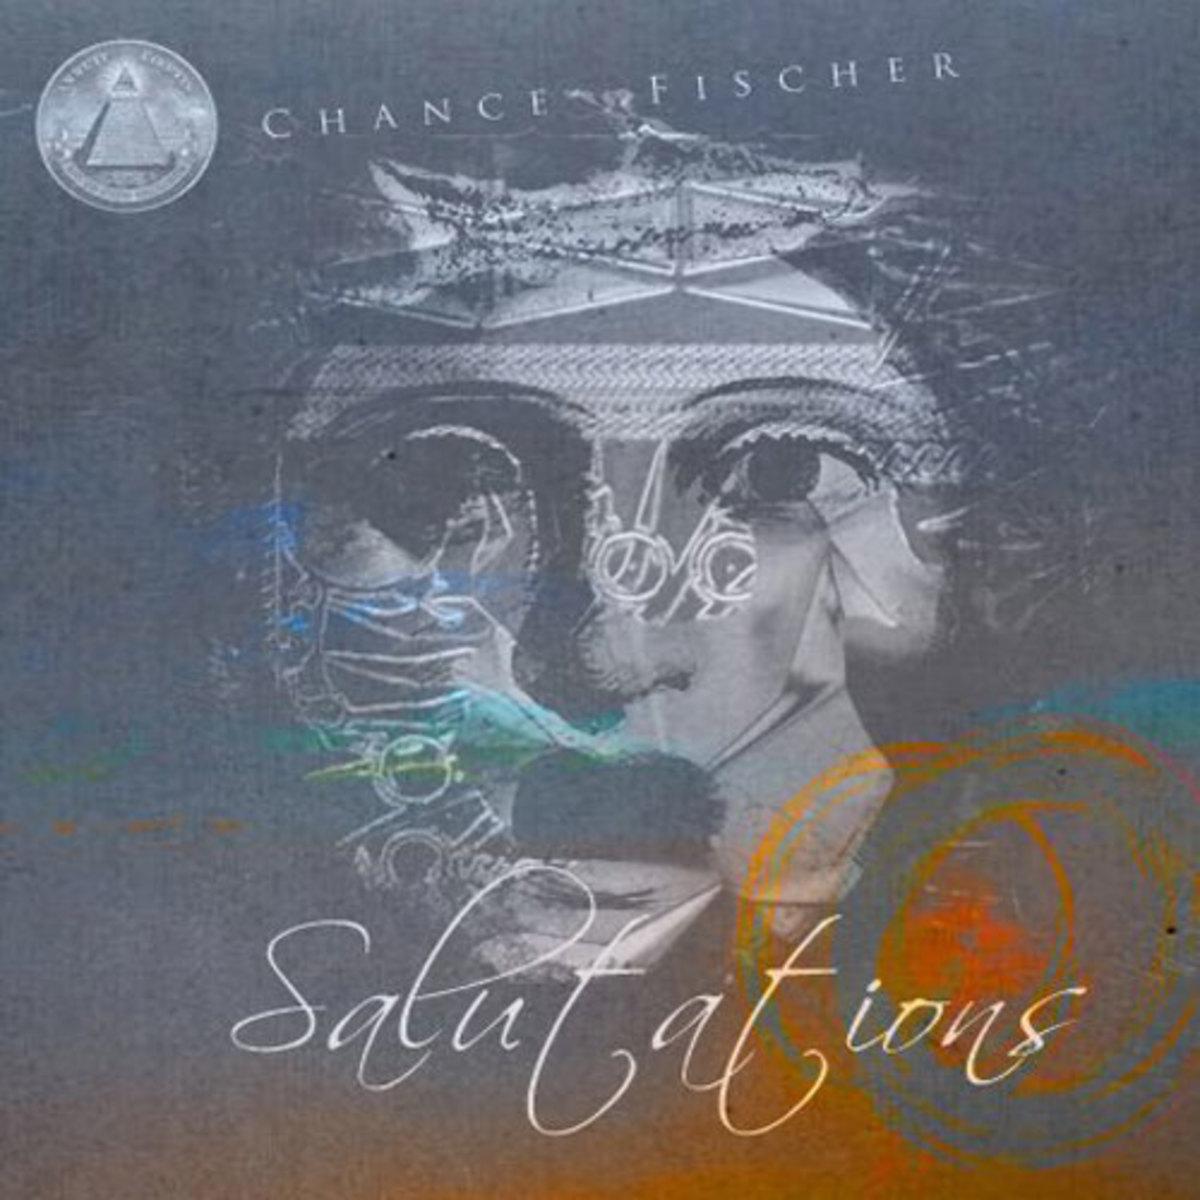 chancefischer-salutations.jpg